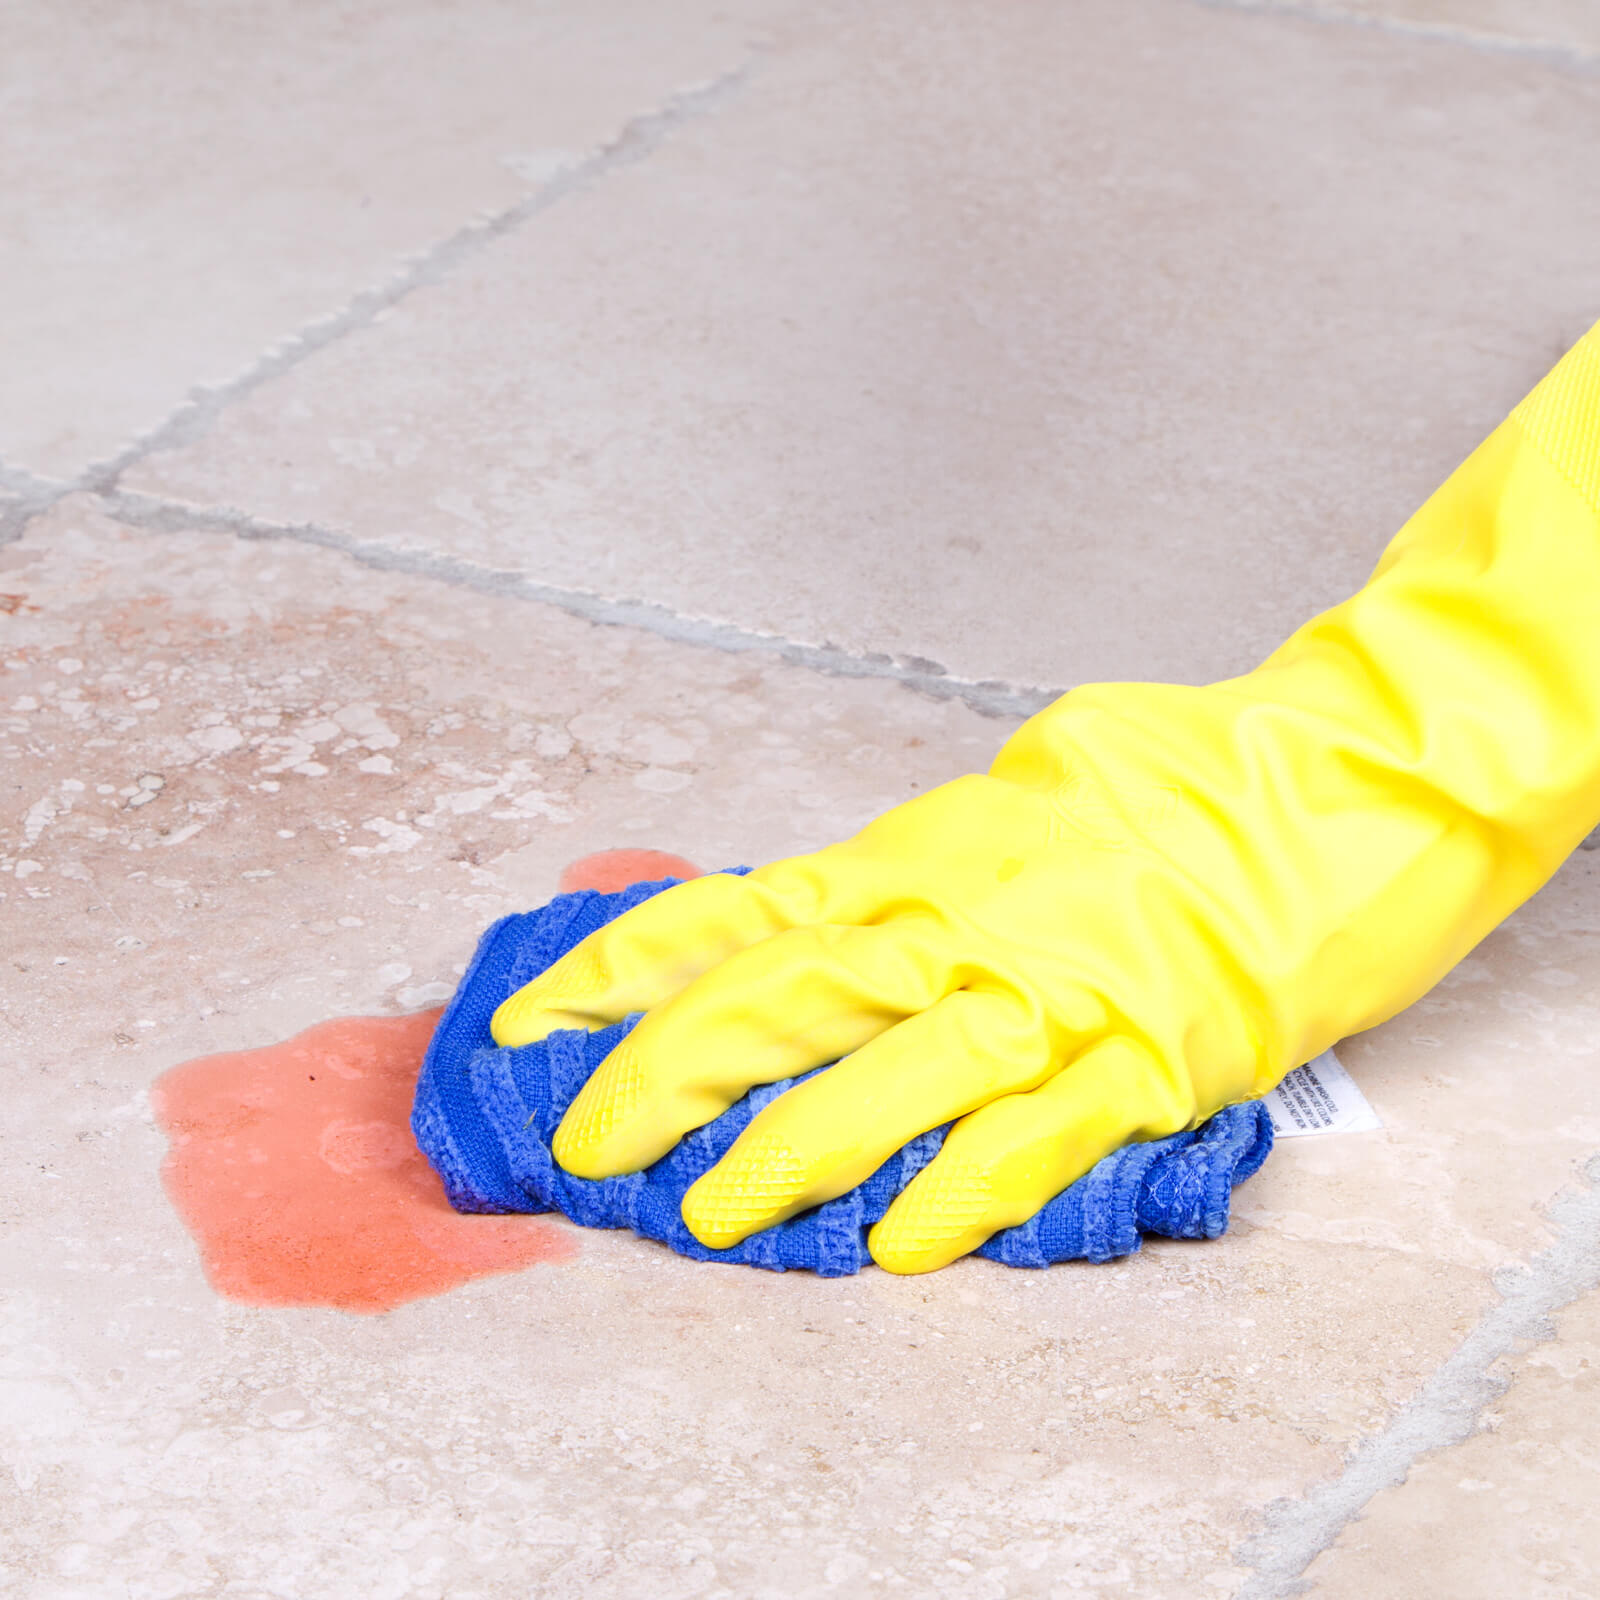 Cleaning a spill off of tile flooring | Kirkland's Flooring